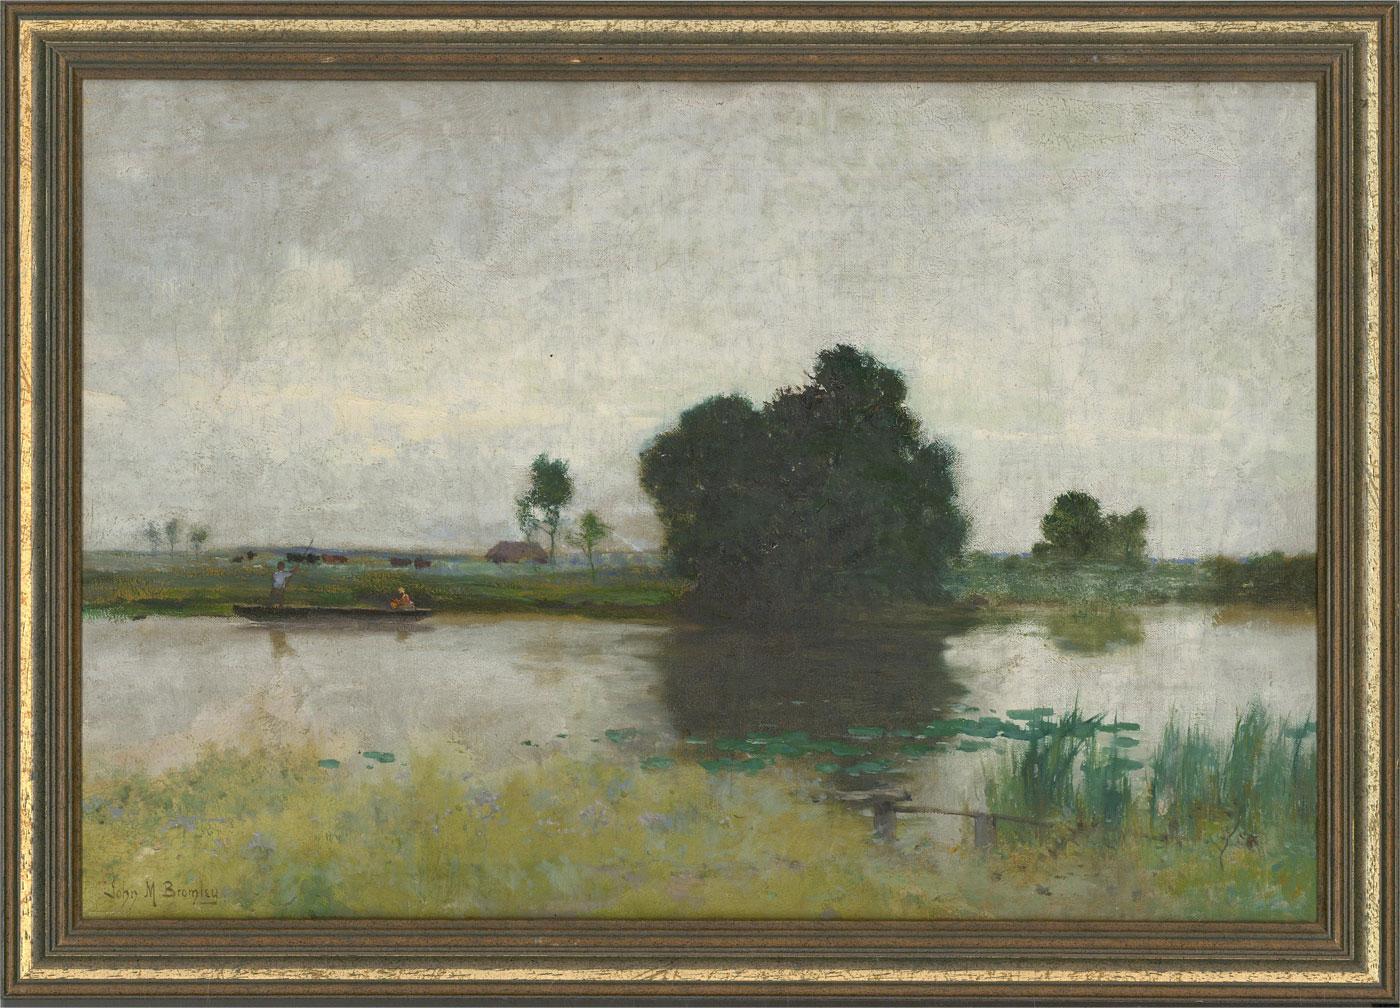 John Mallard Bromley RBA (1858-1939) - Late 19th Century Oil, Punting on a River